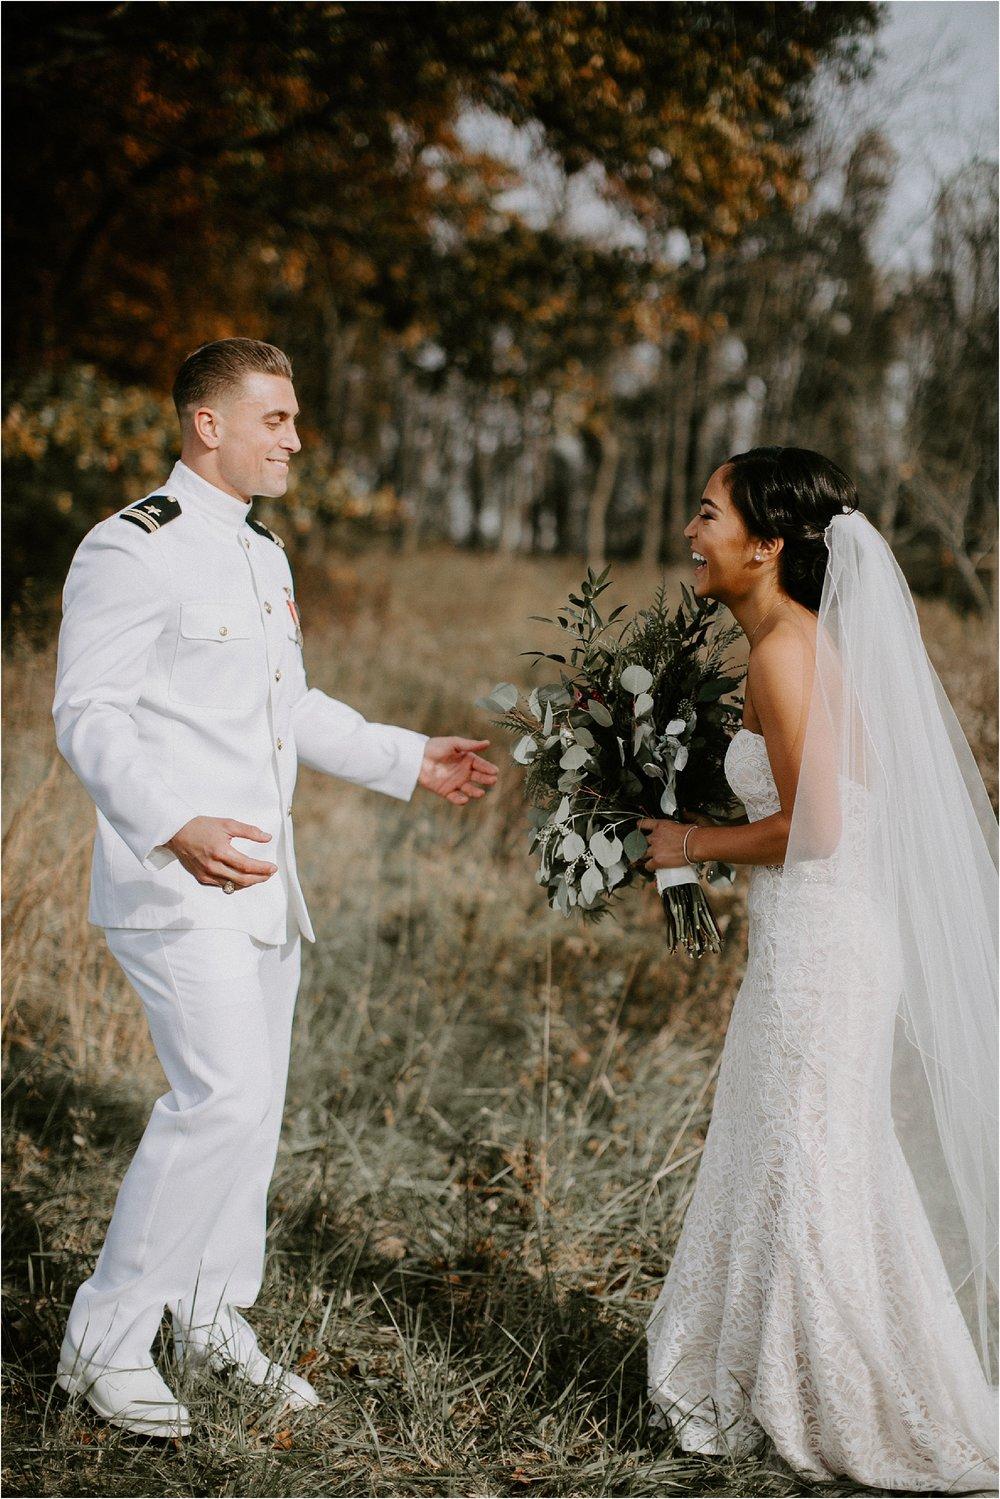 Sarah_Brookhart_Harrisburg_Wedding_Photographer_0014.jpg